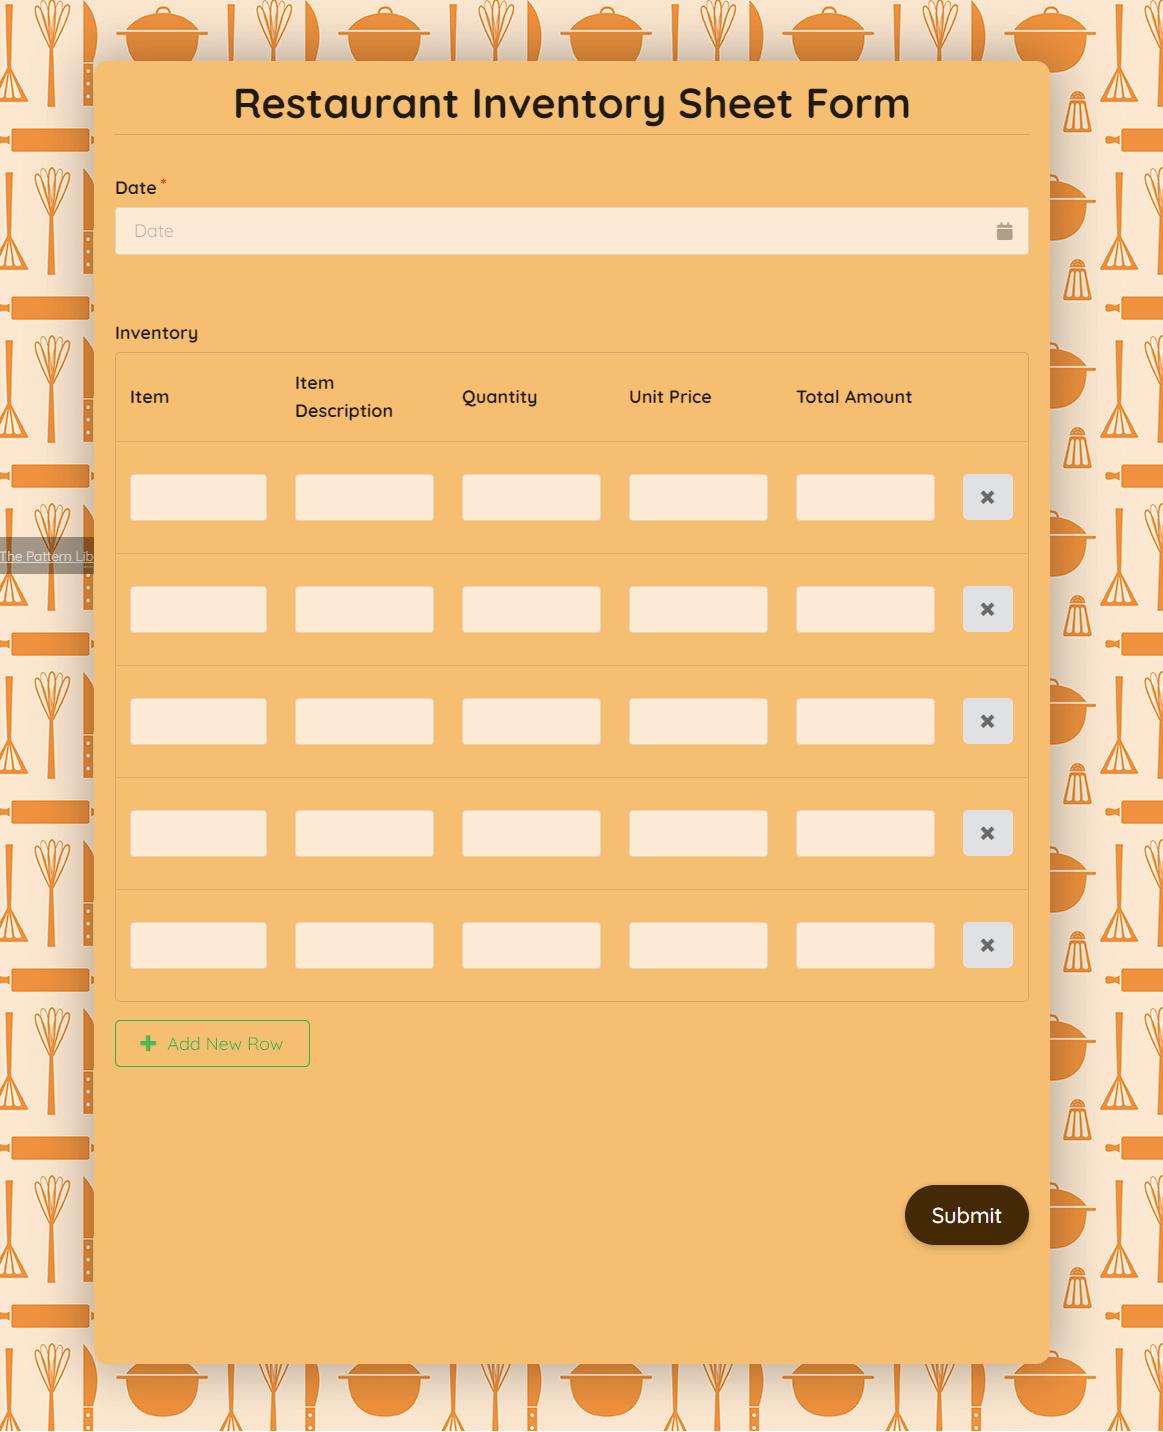 Restuarant Inventory Sheet Form template